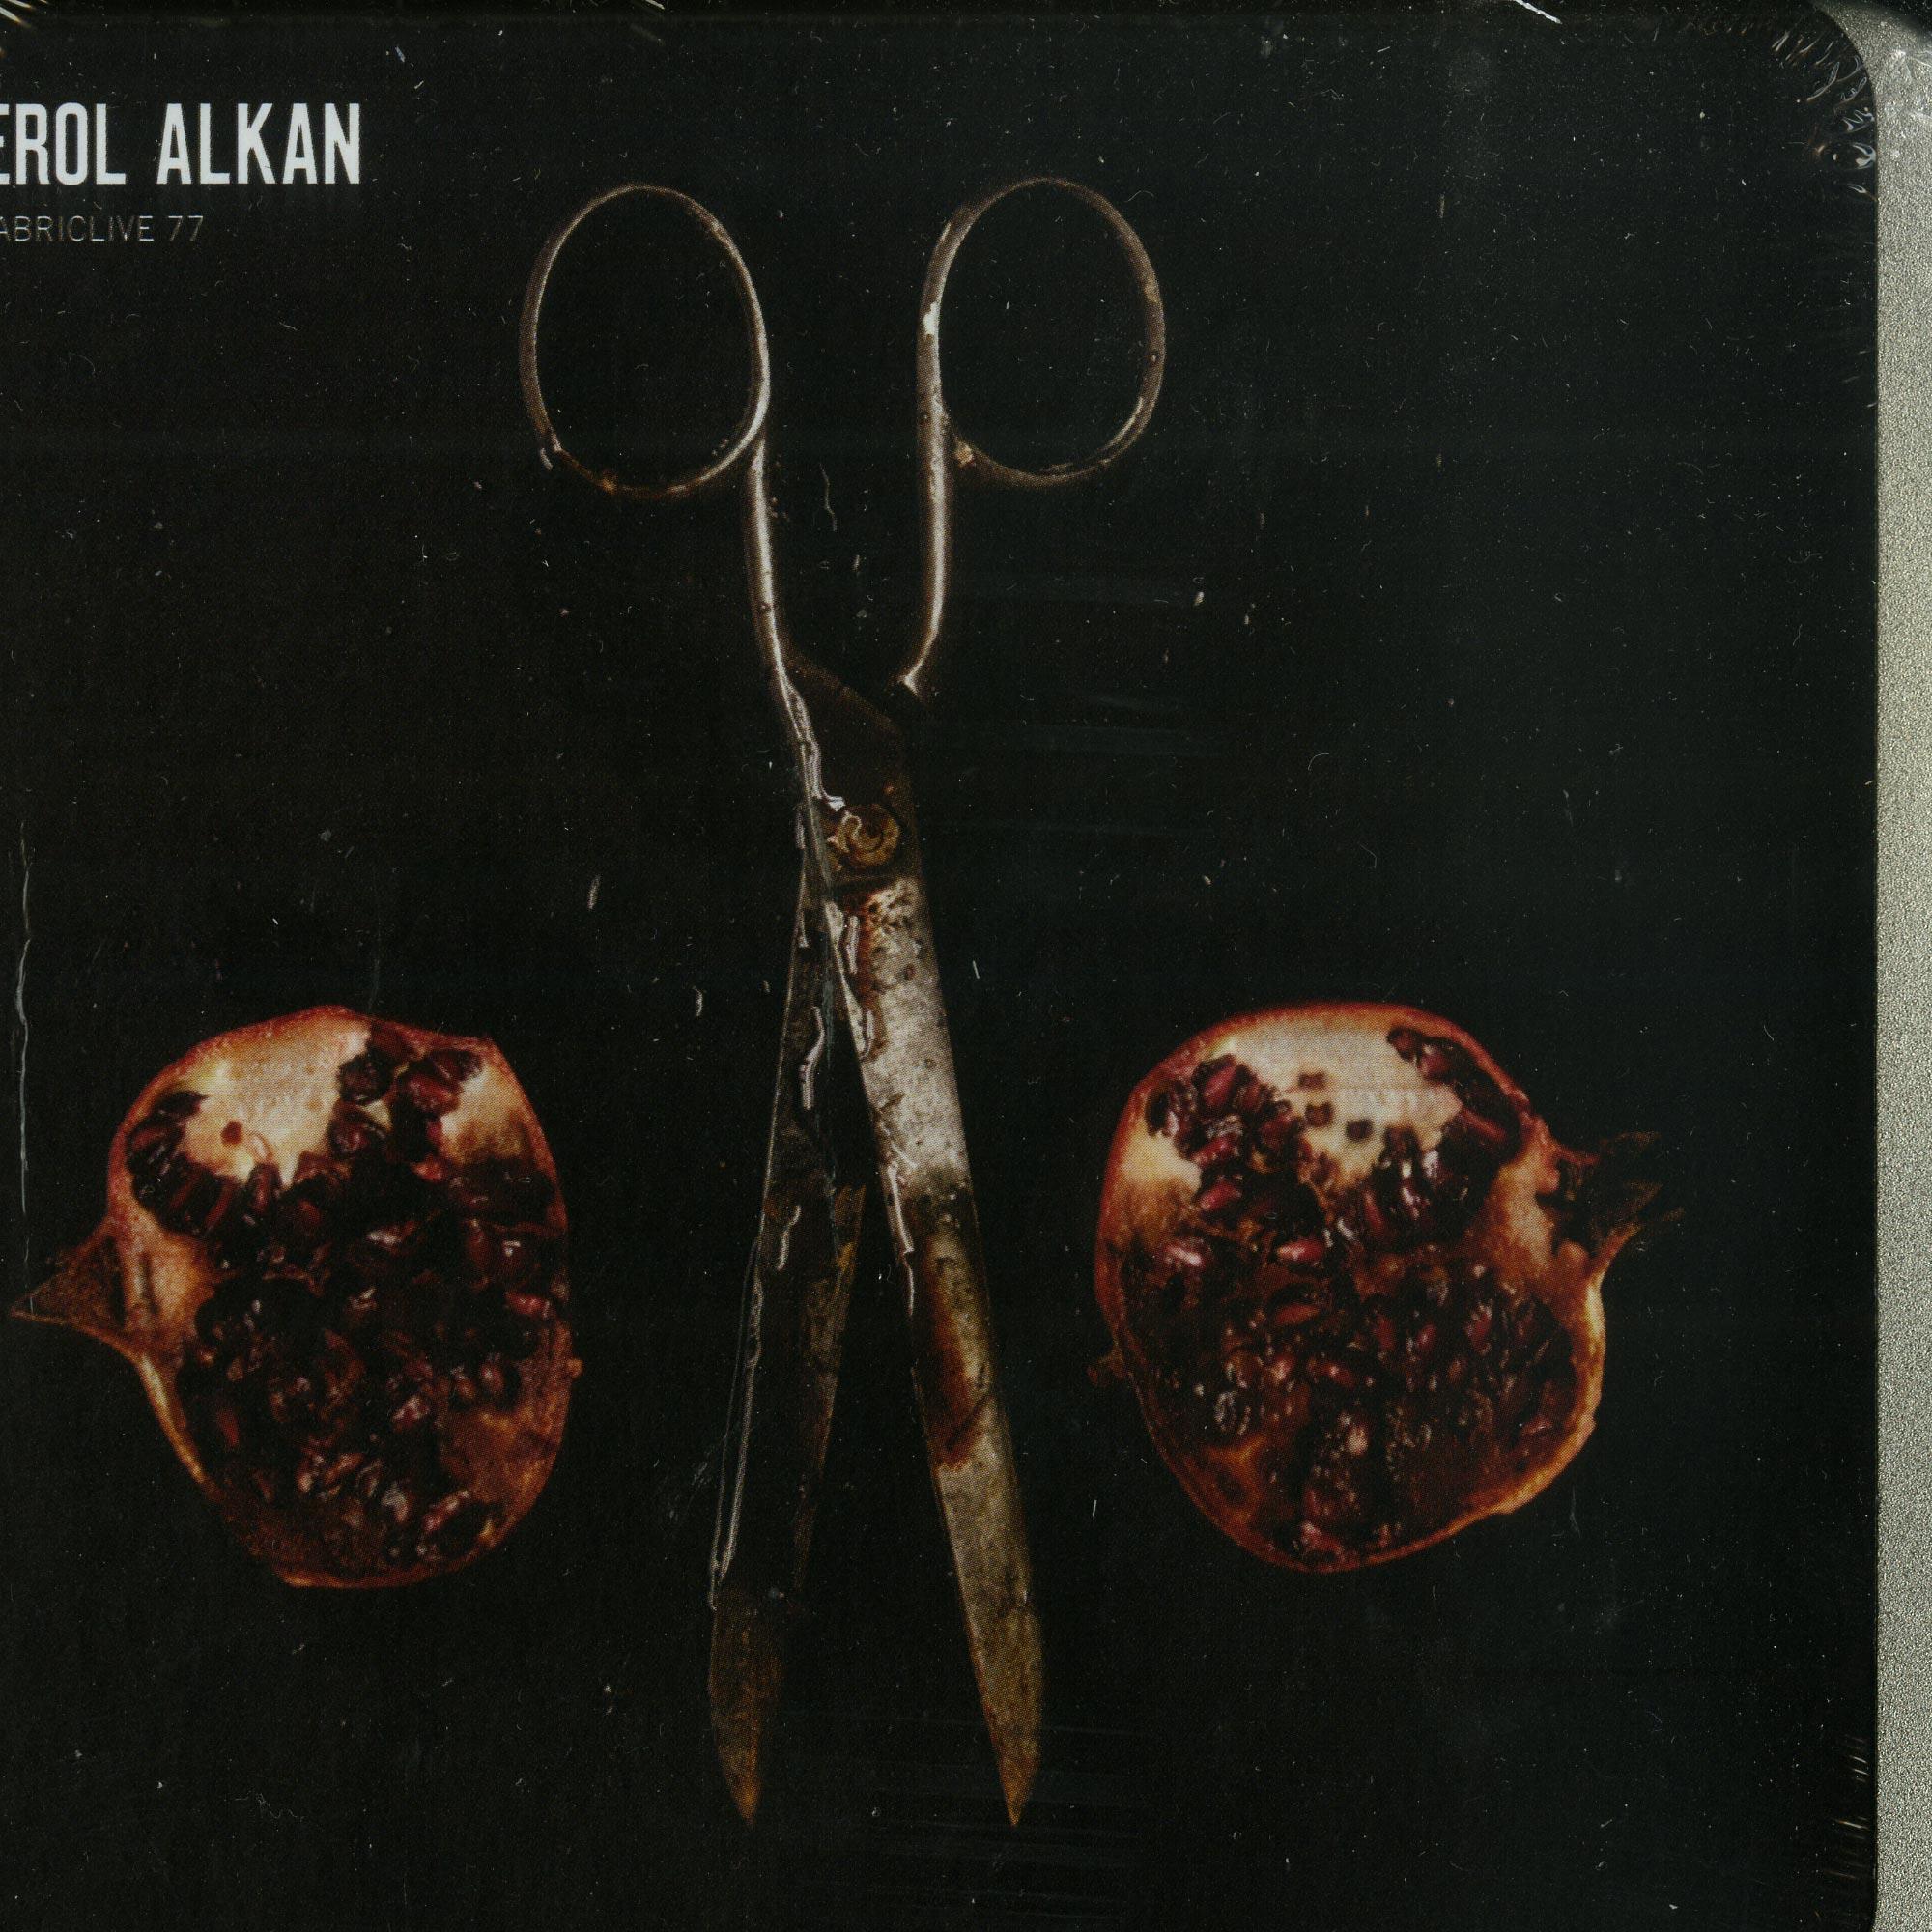 Erol Alkan - FABRIC LIVE 77